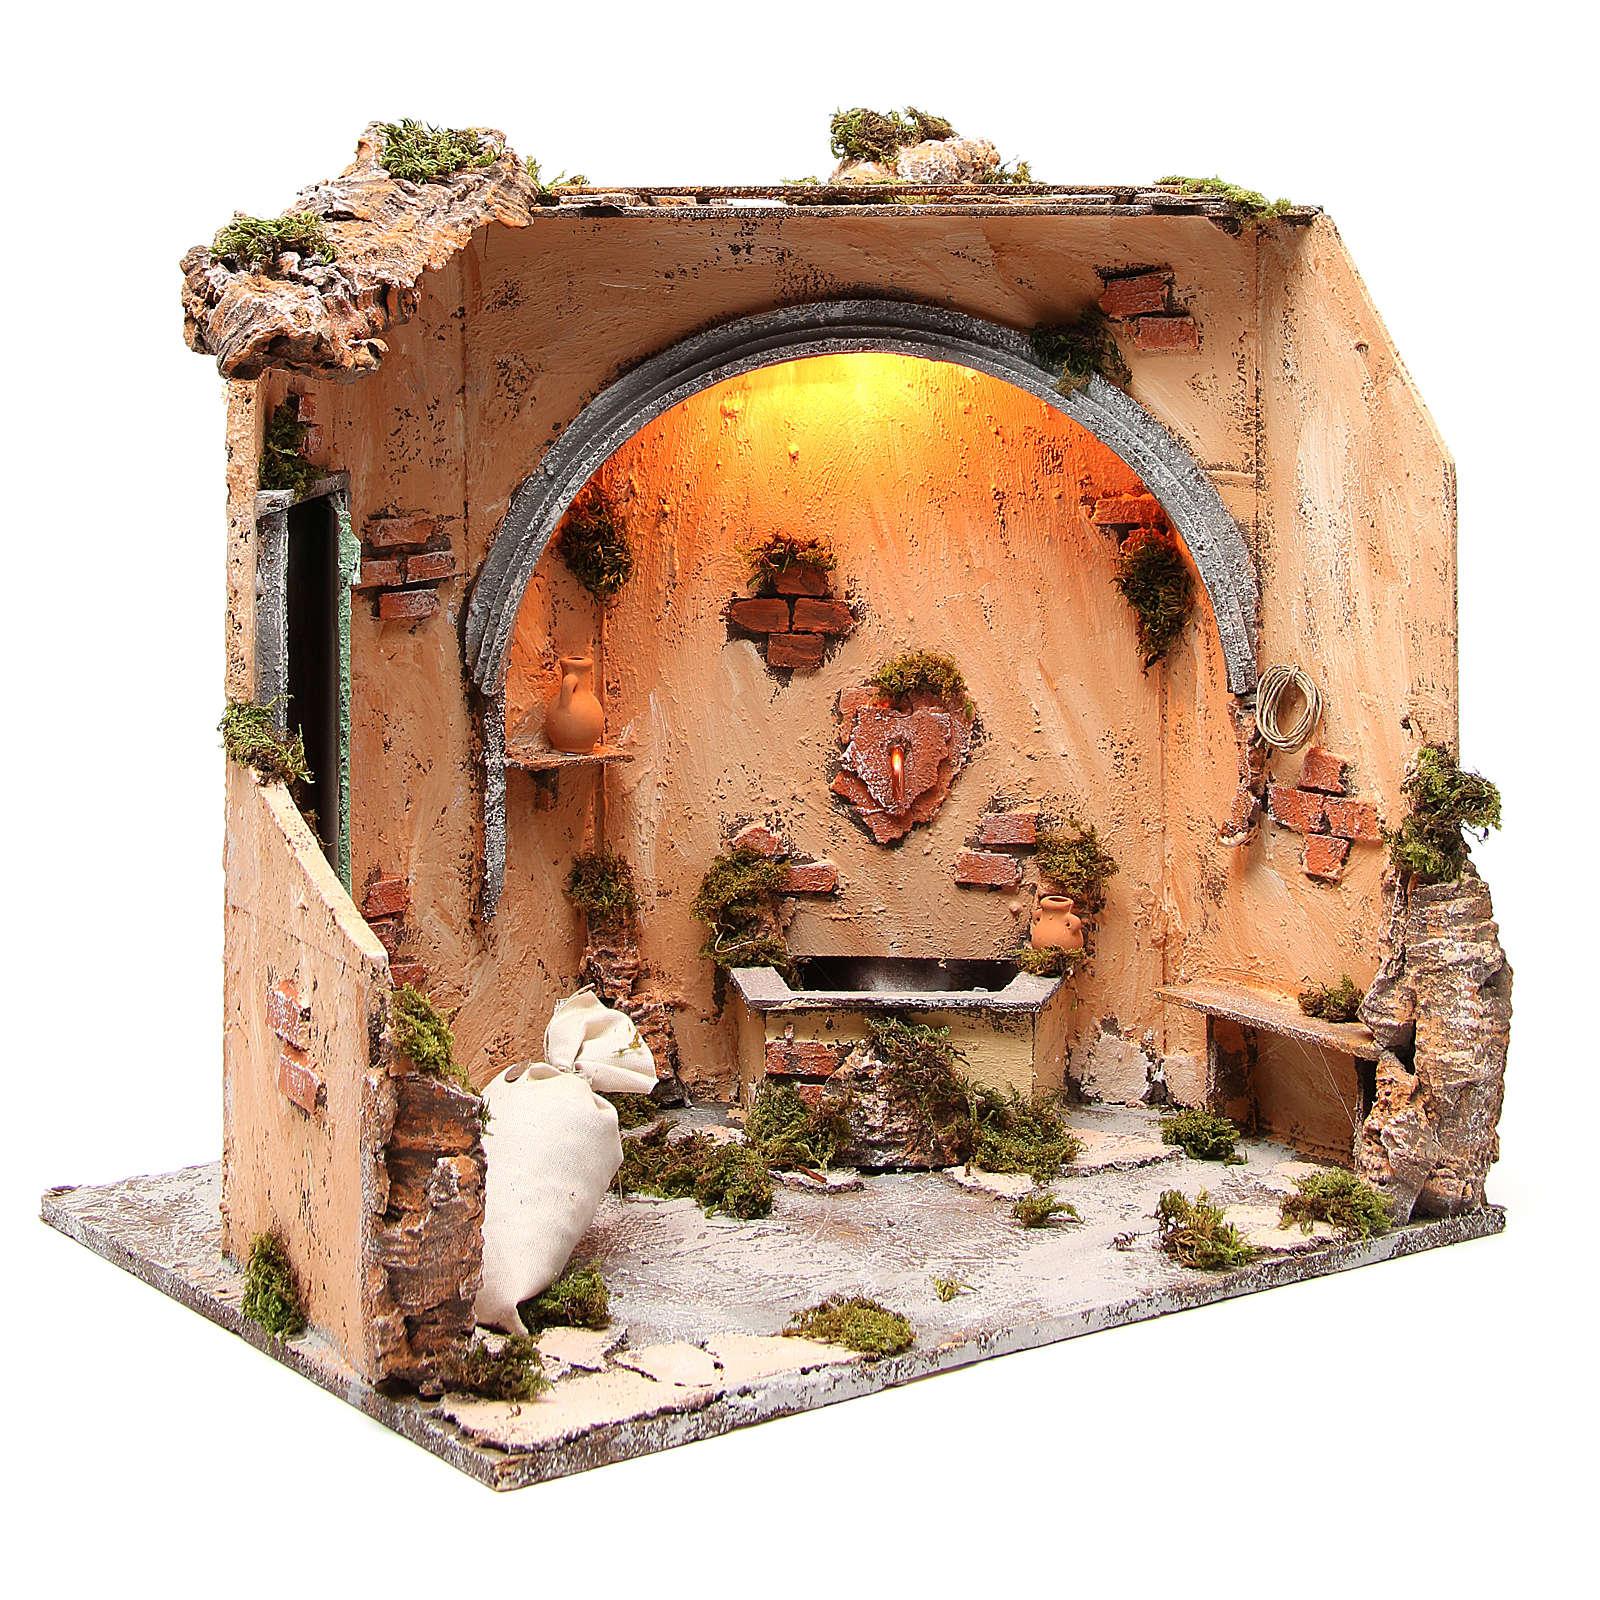 Basement scenery 40X40X40 cm Neapolitan Nativity 4